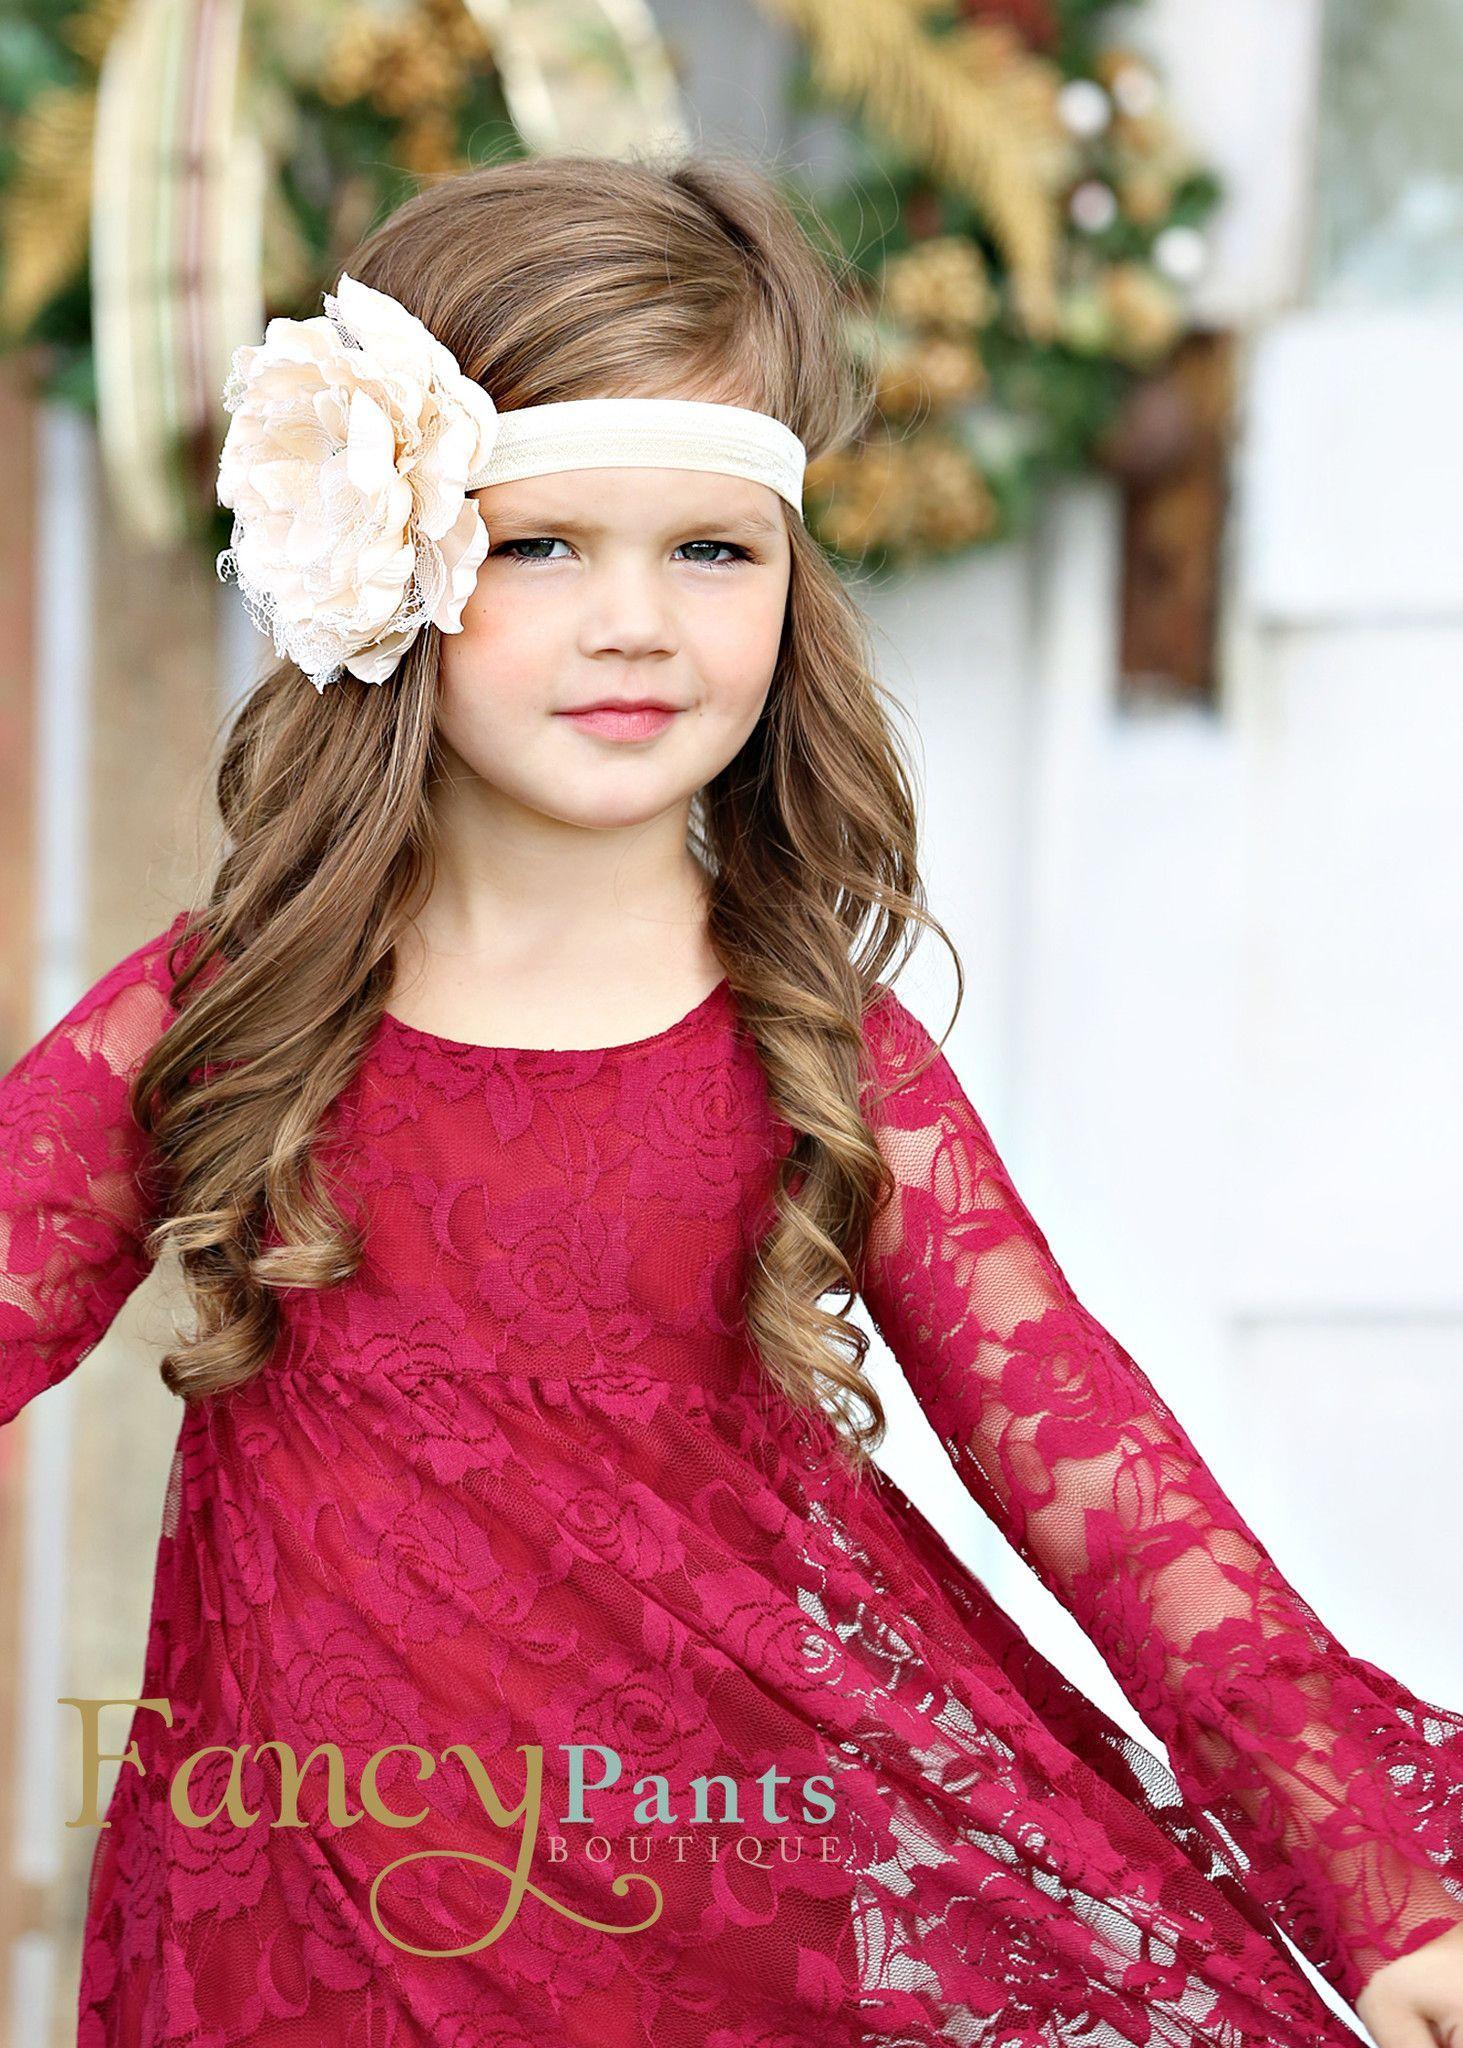 Burgundy Boho Chic Lace Dress  My Style  Girls Christmas -6857